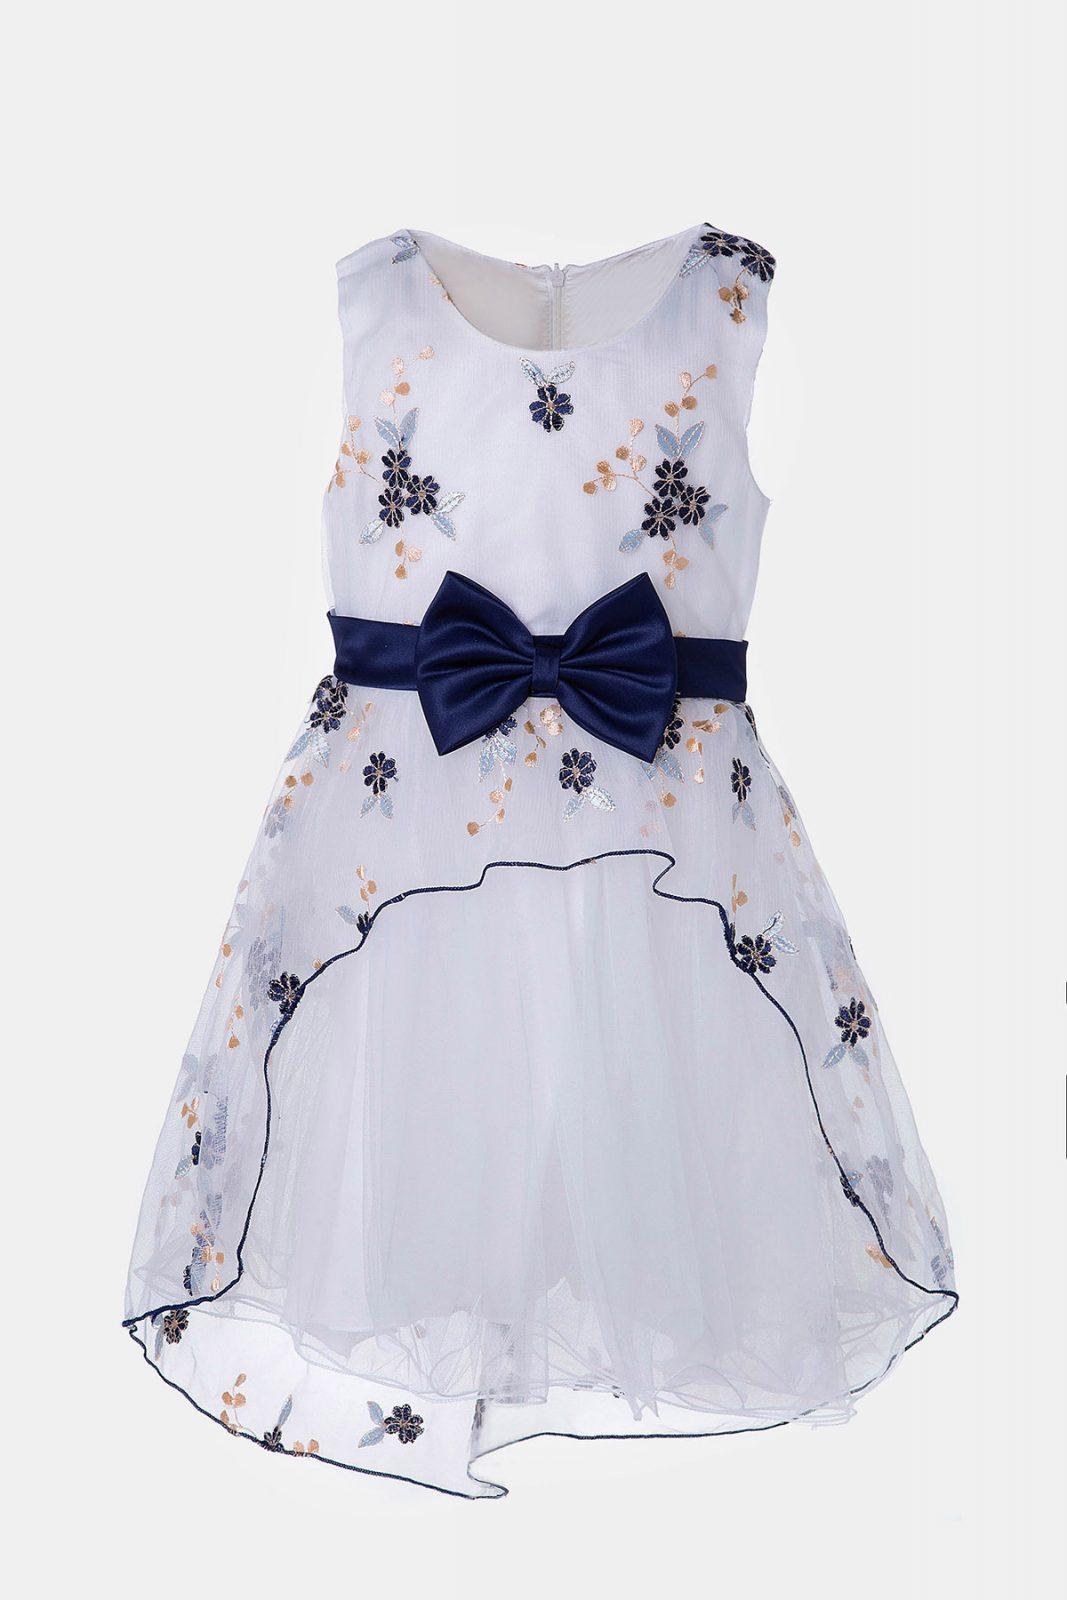 6a2de25ff18e Παιδικό φόρεμα εμπριμέ με μπλε φιόγκο και λουλούδια